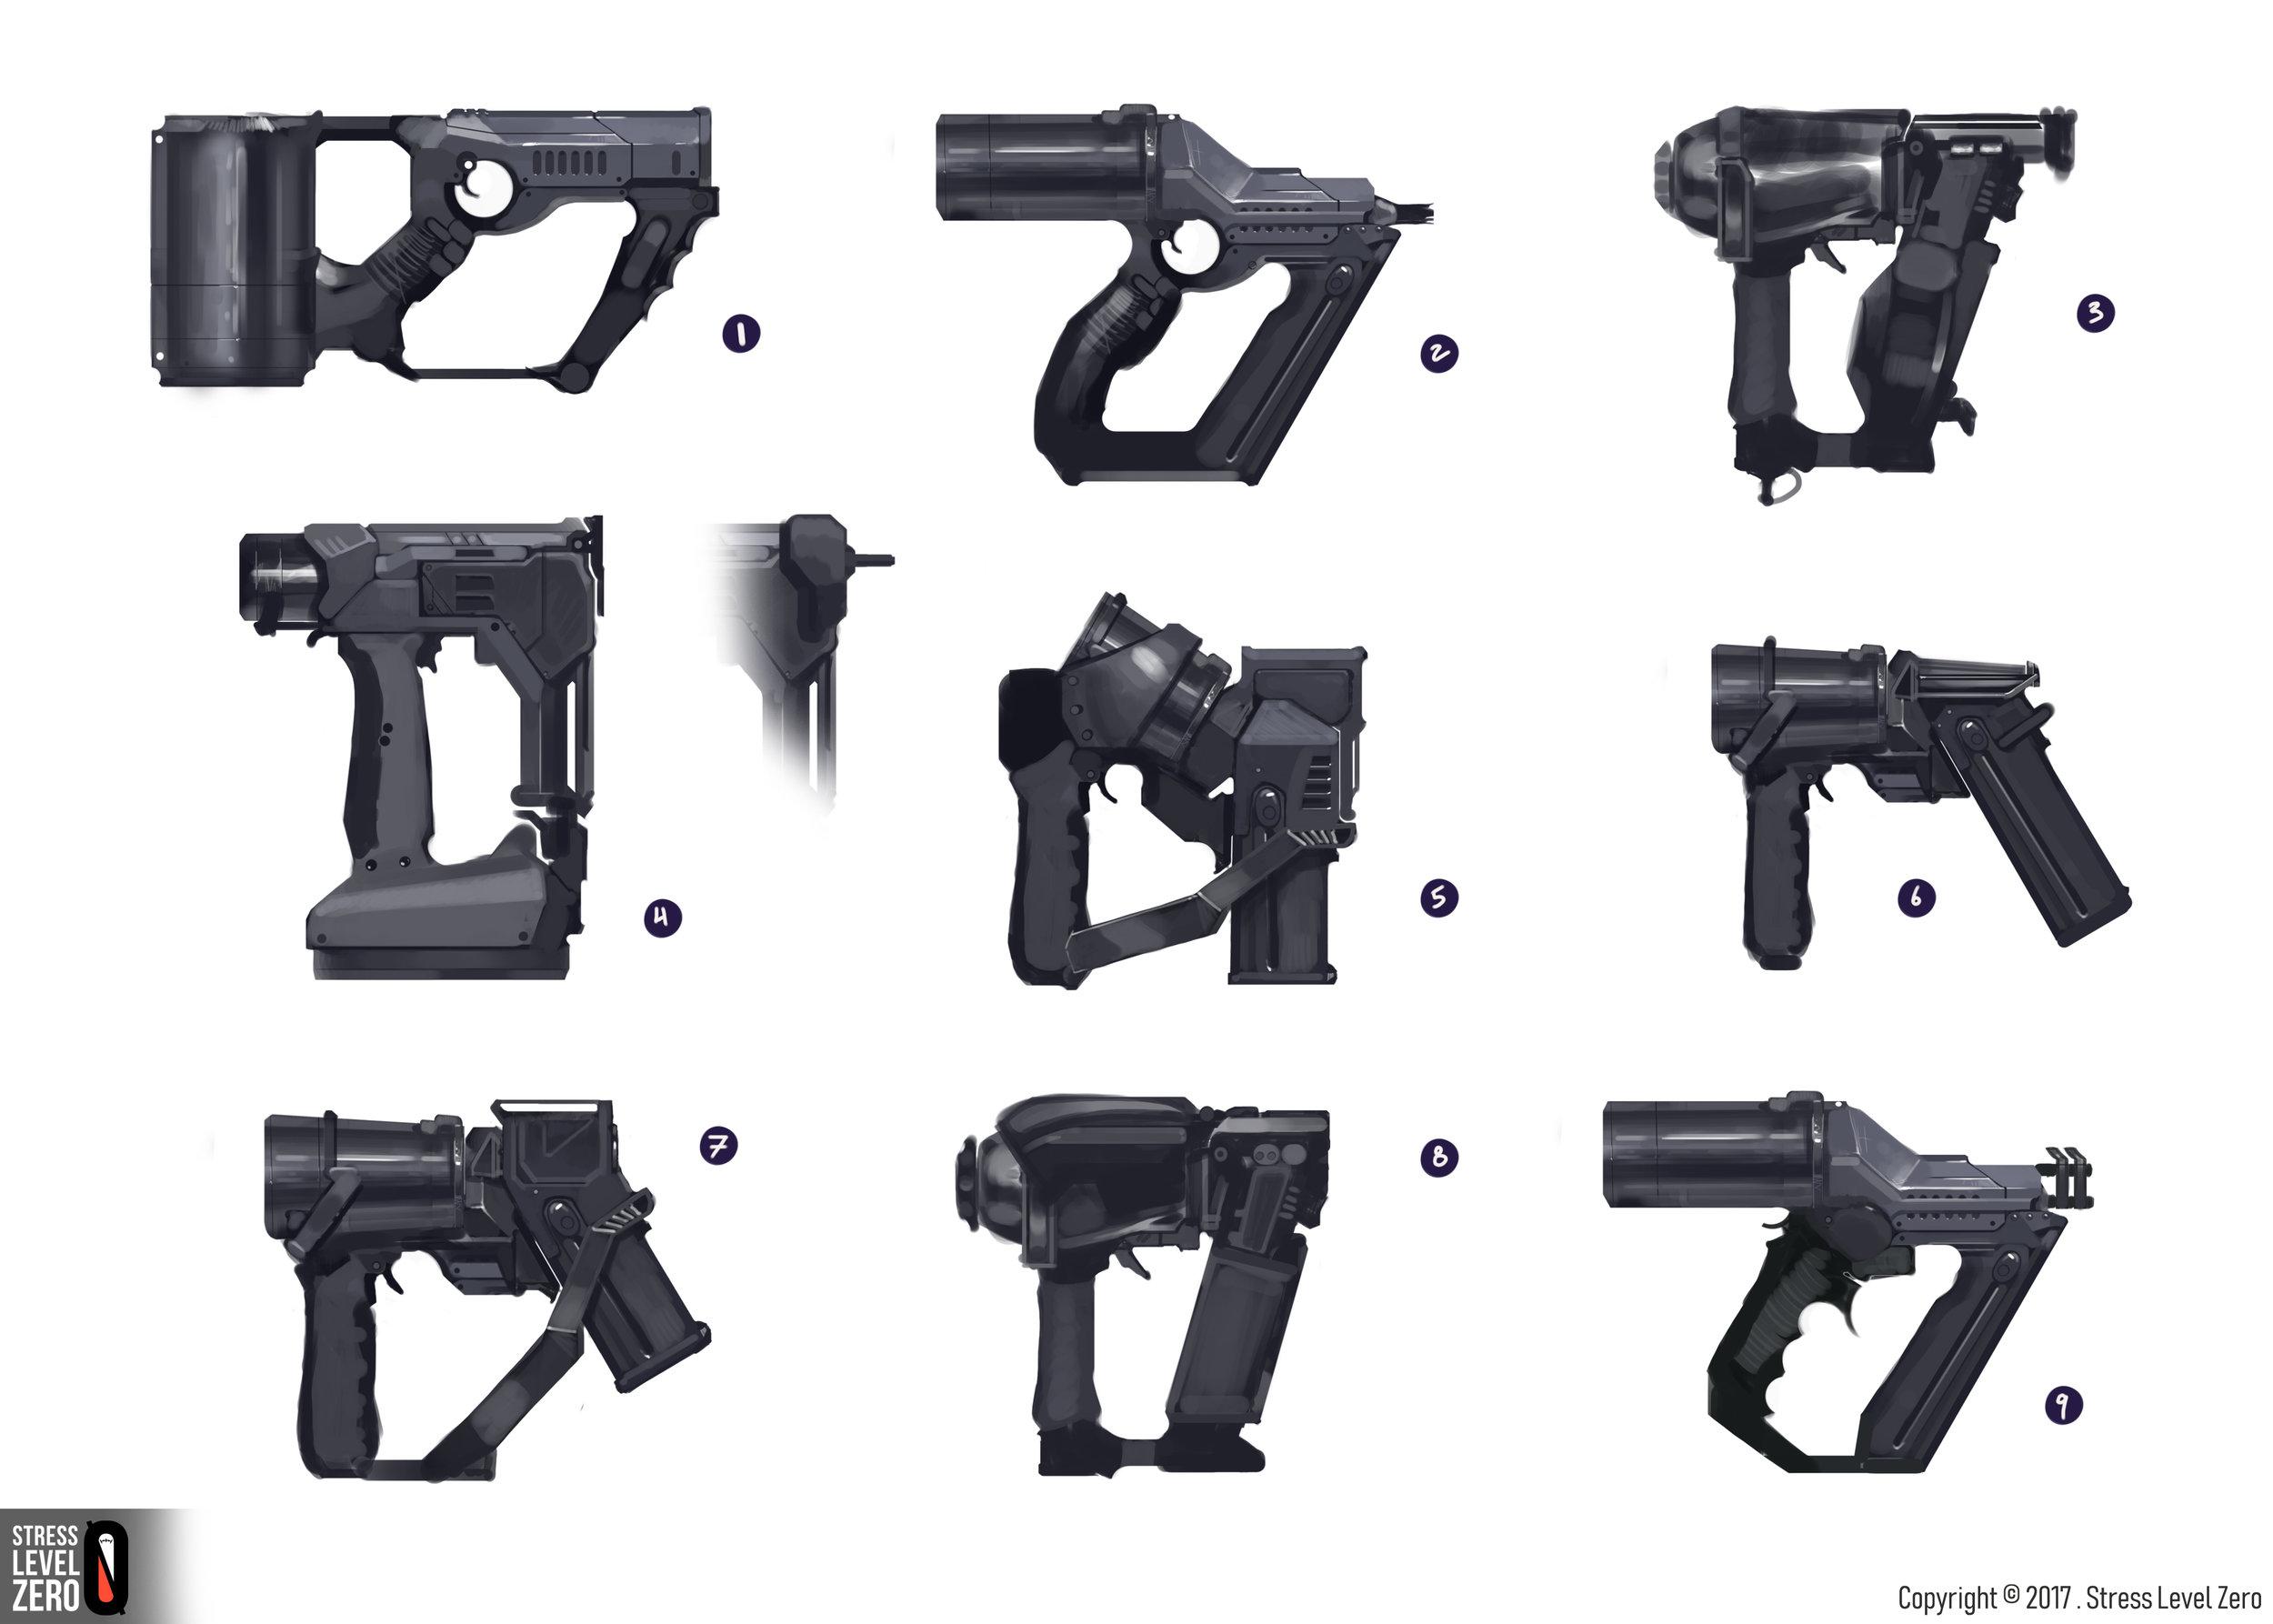 Player_WeaponSheet2_WATERMARKED.jpg